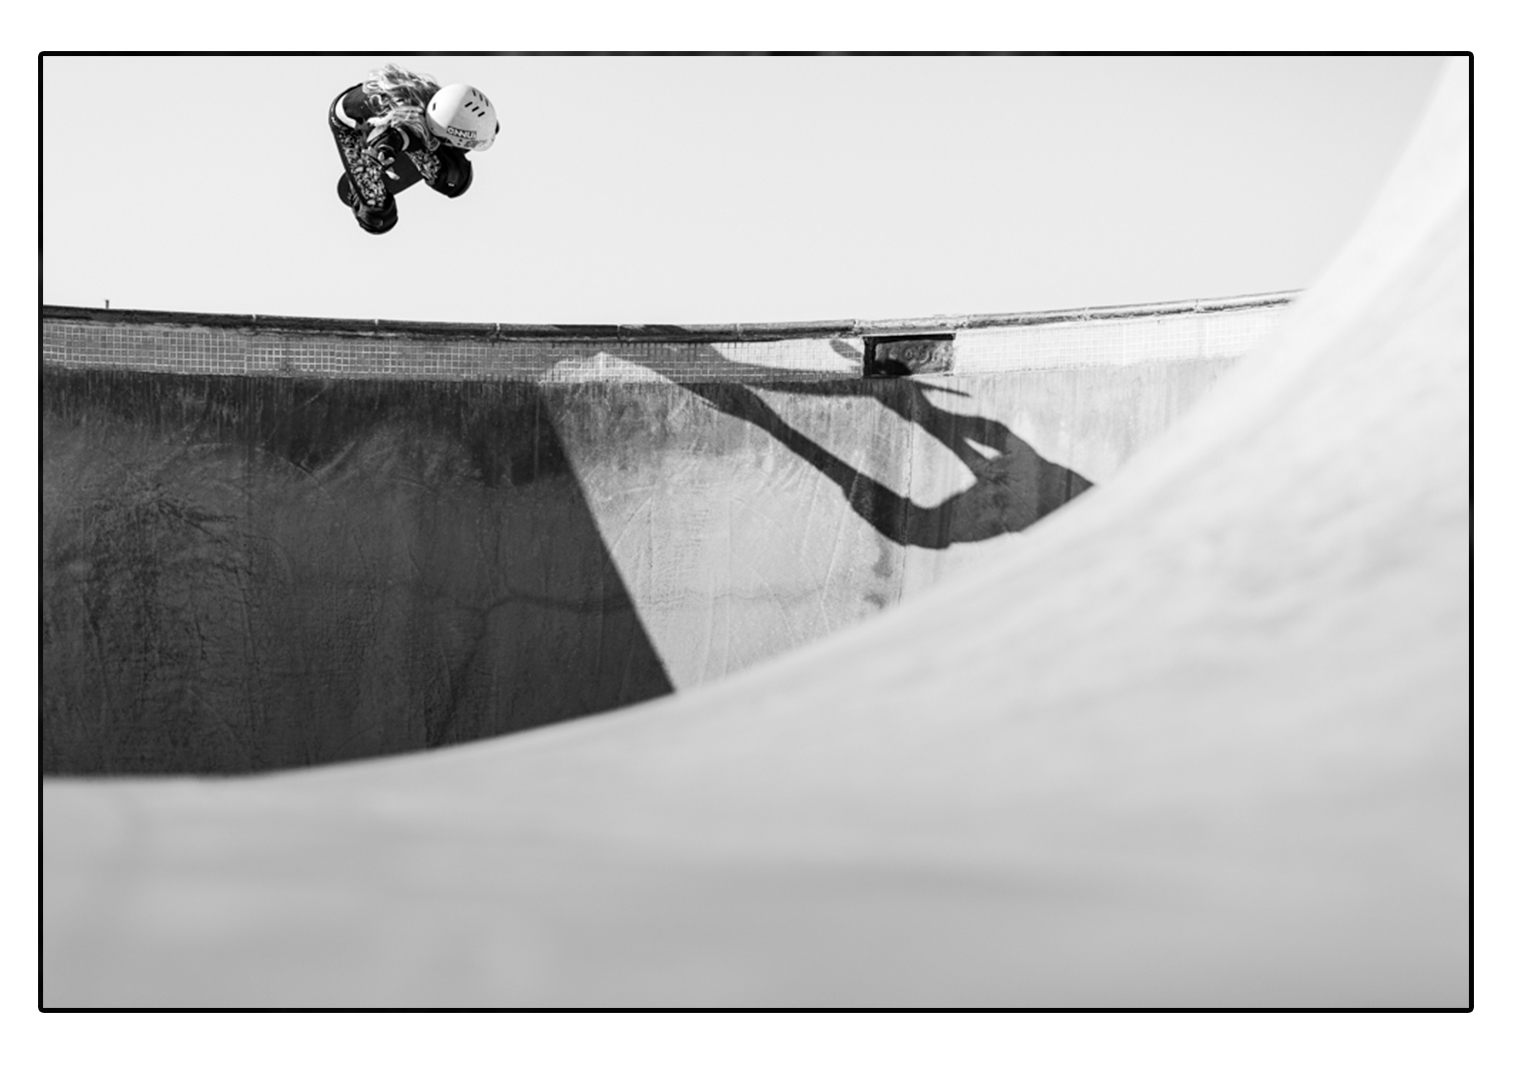 Daniela-Skate-Barna-1546x1080